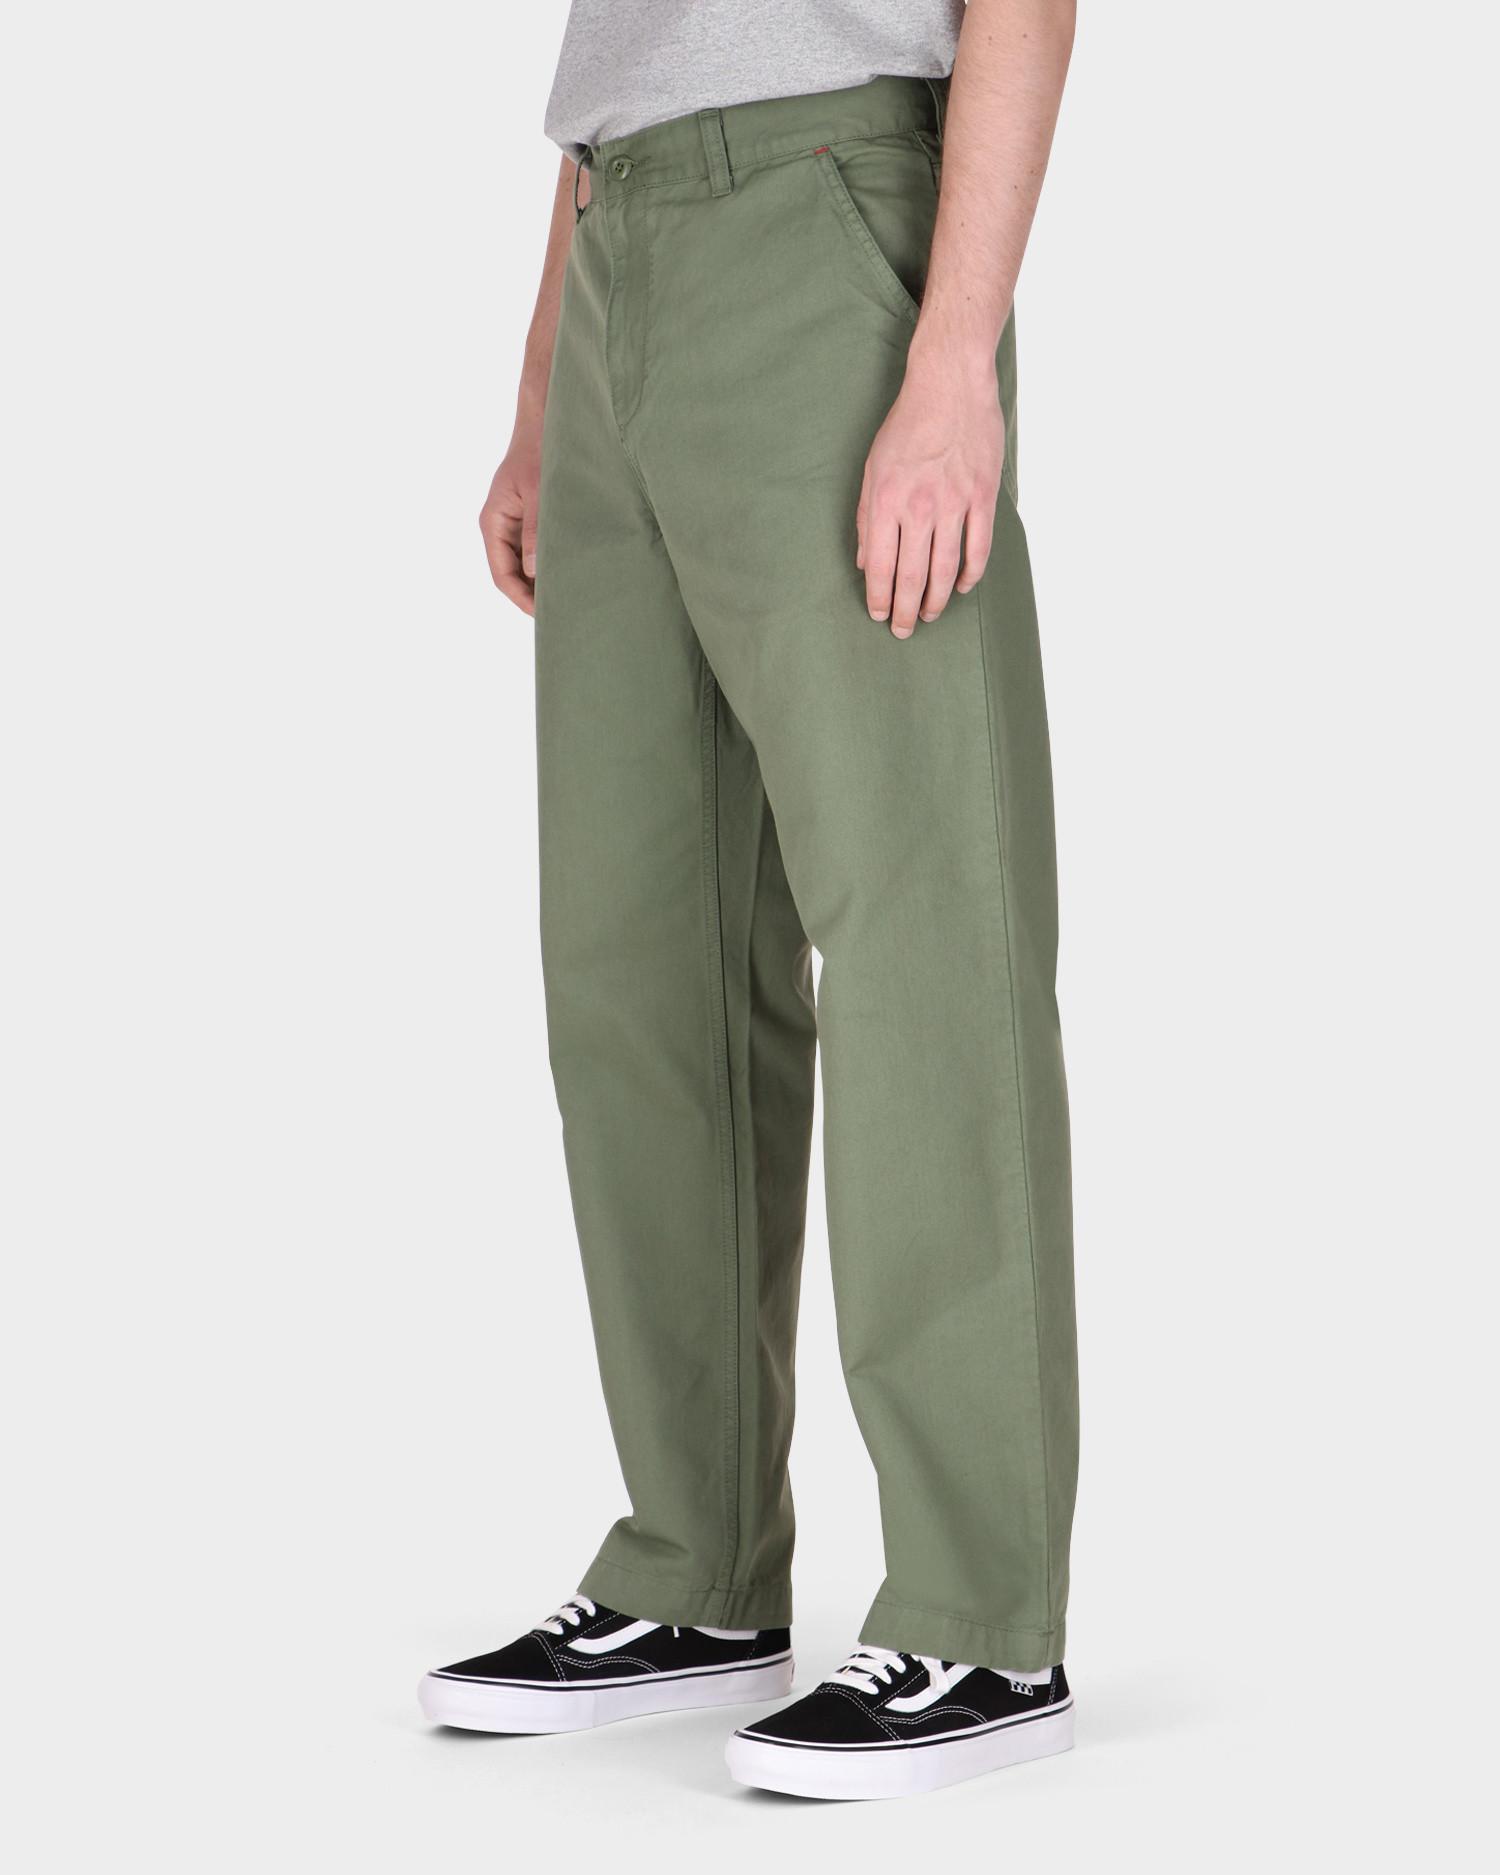 Carhartt Wesley Pant Cotton Dollar Green